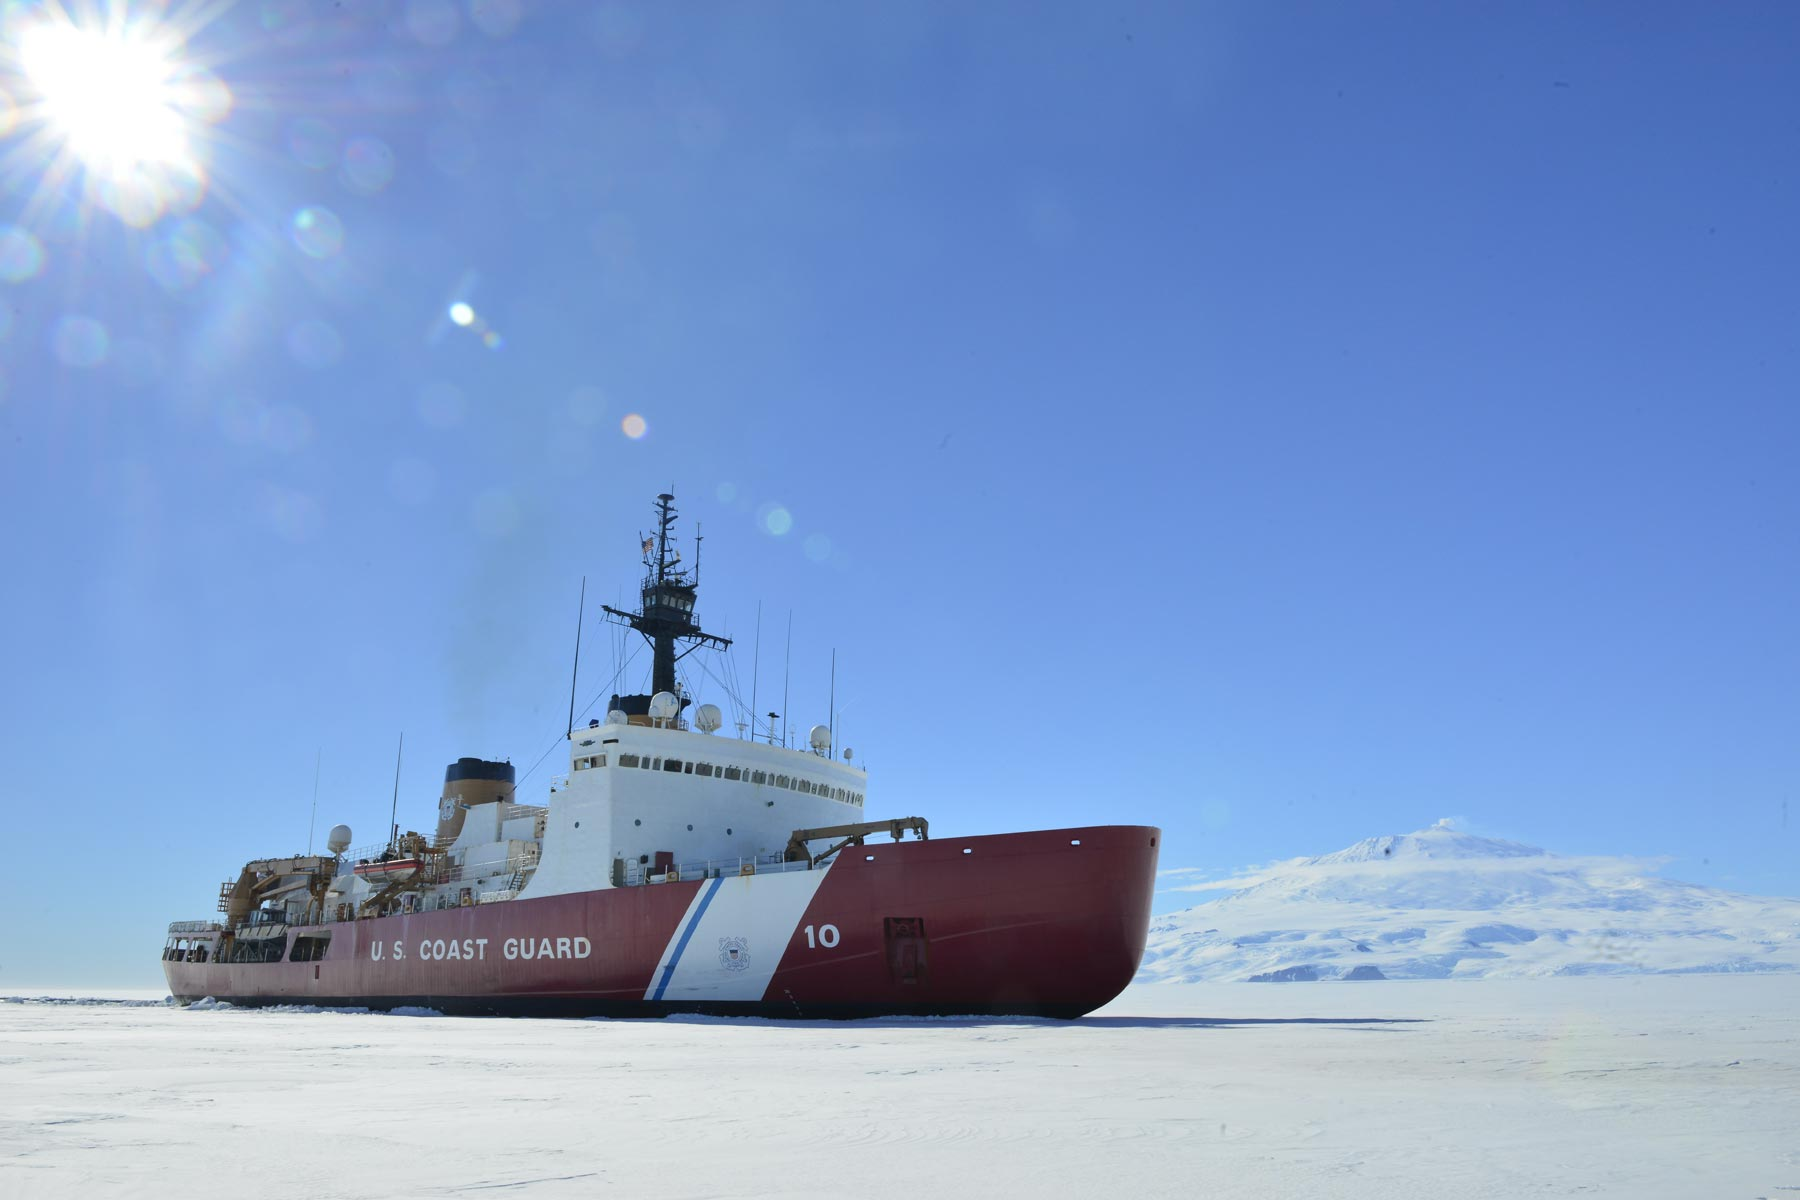 Congress Finally Funds New Icebreaker for Coast Guard